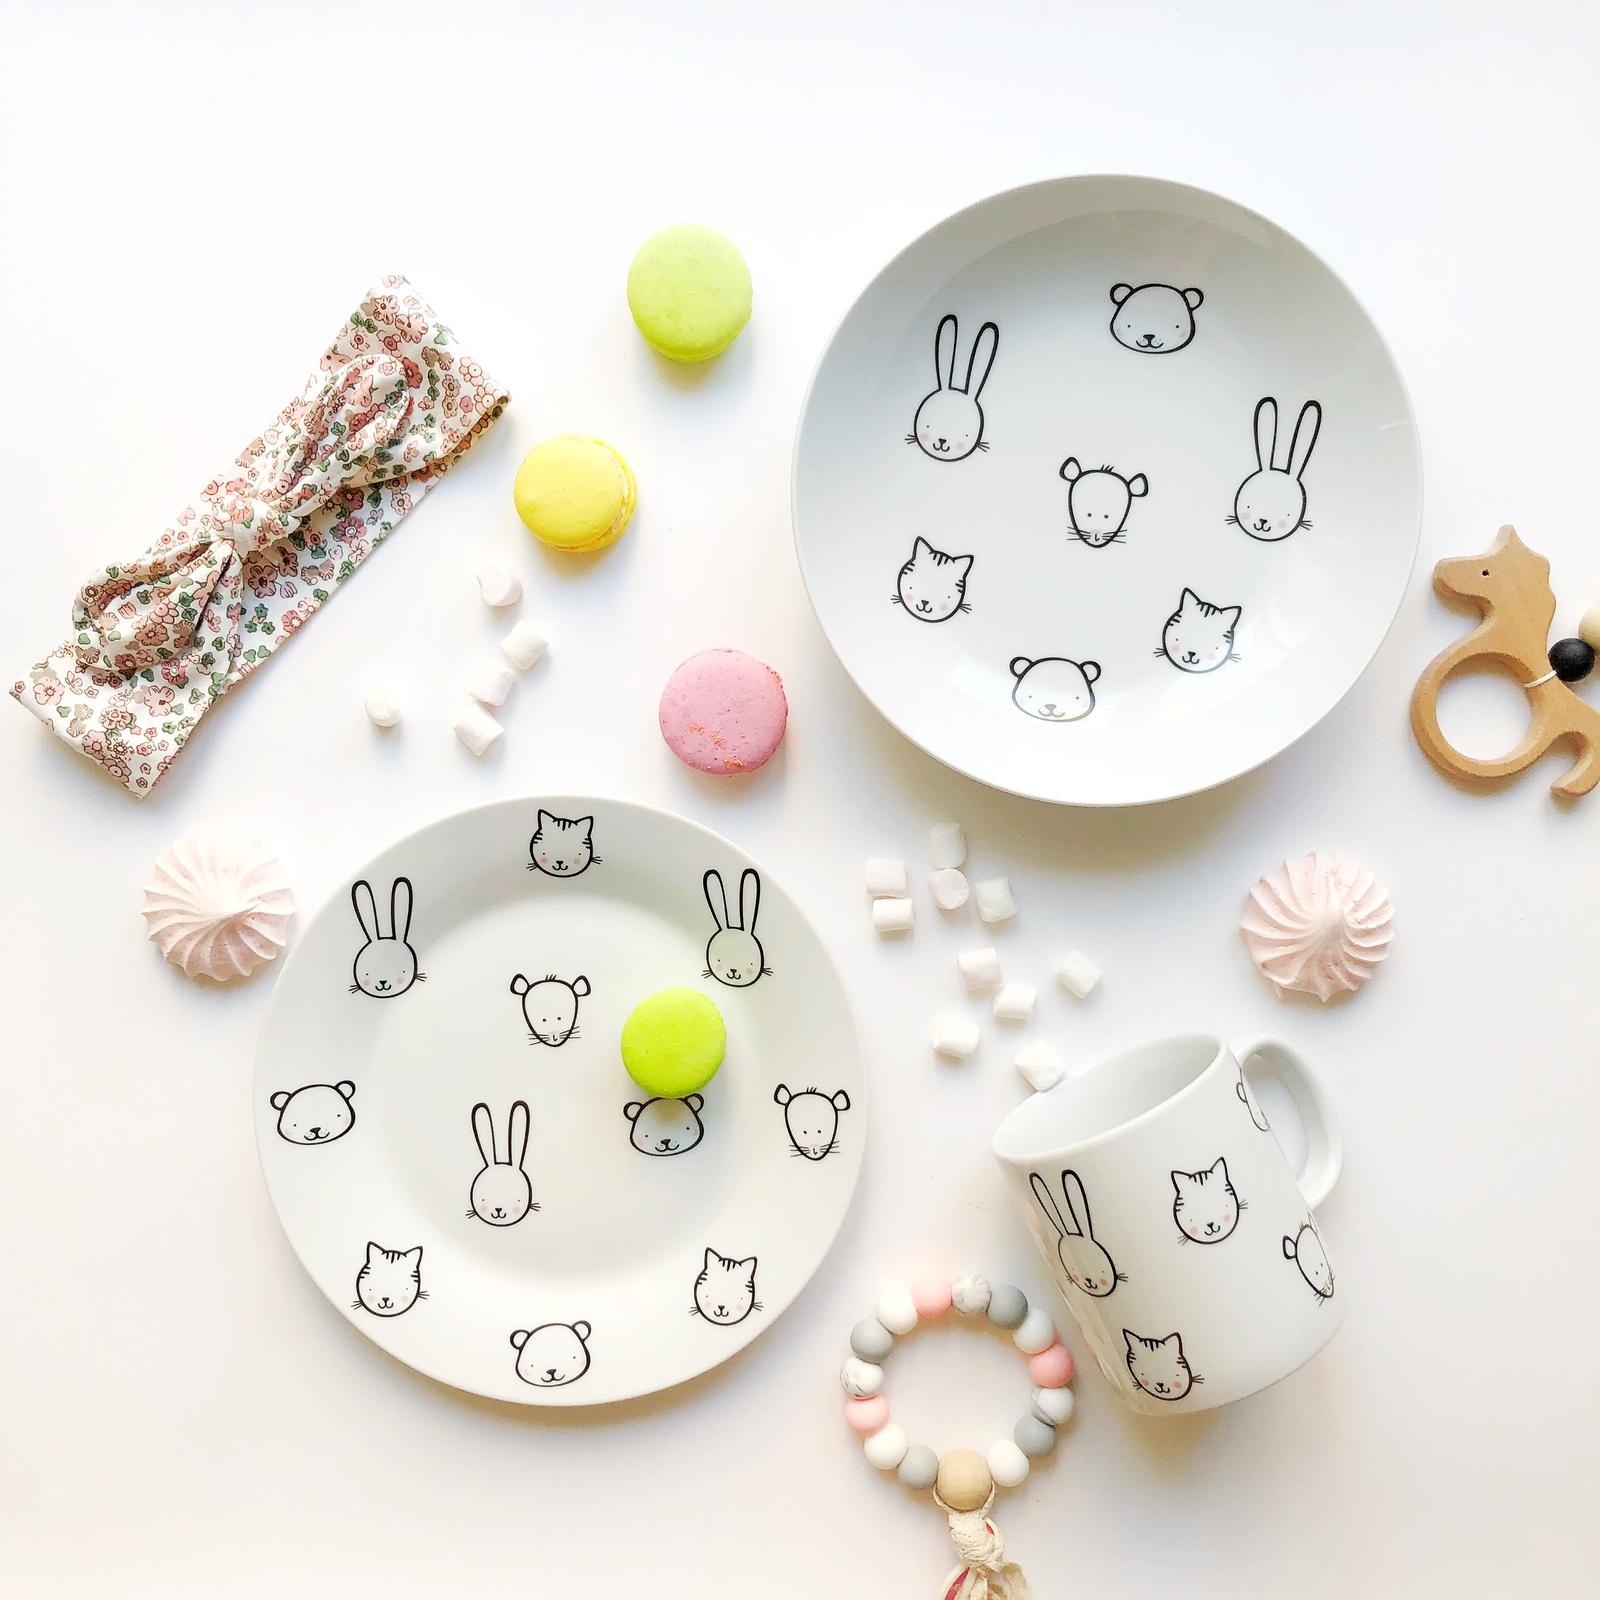 Набор посуды Ферма (3 в 1: кружка+тарелка+глубокая тарелка Sans Brides)